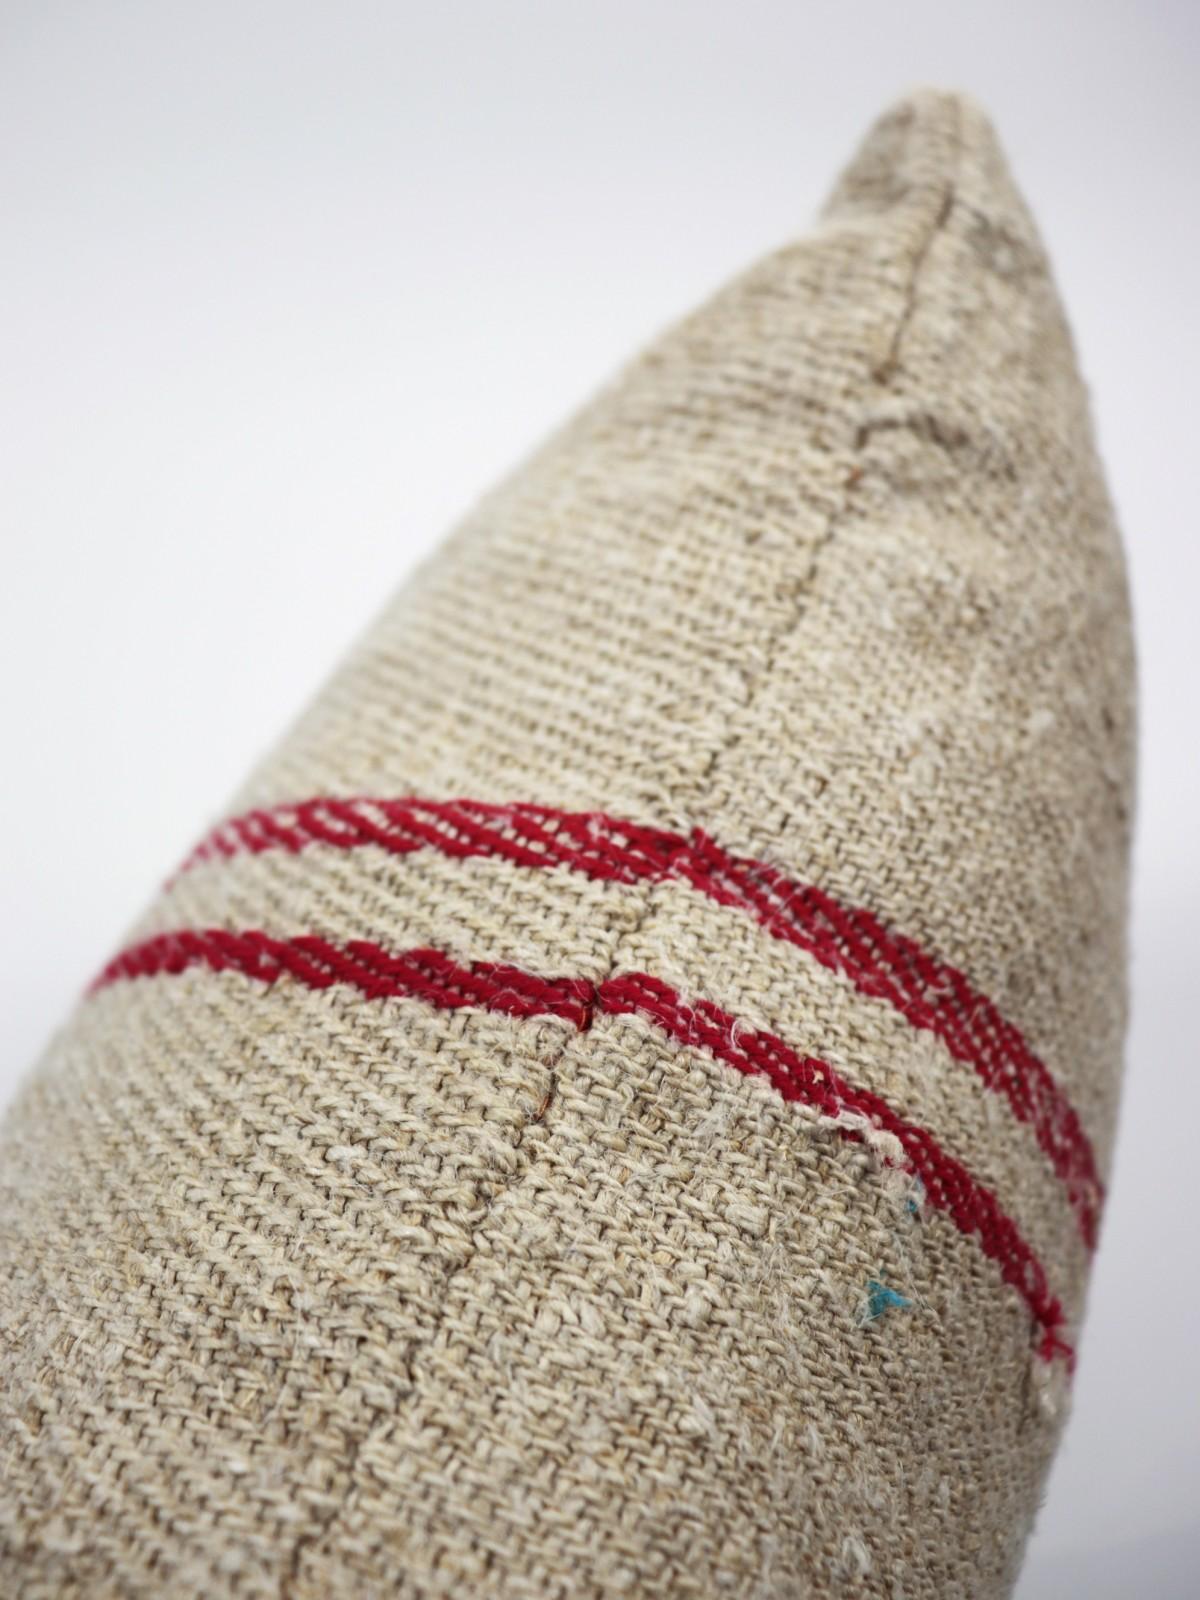 grain sack, brown remake, cushion